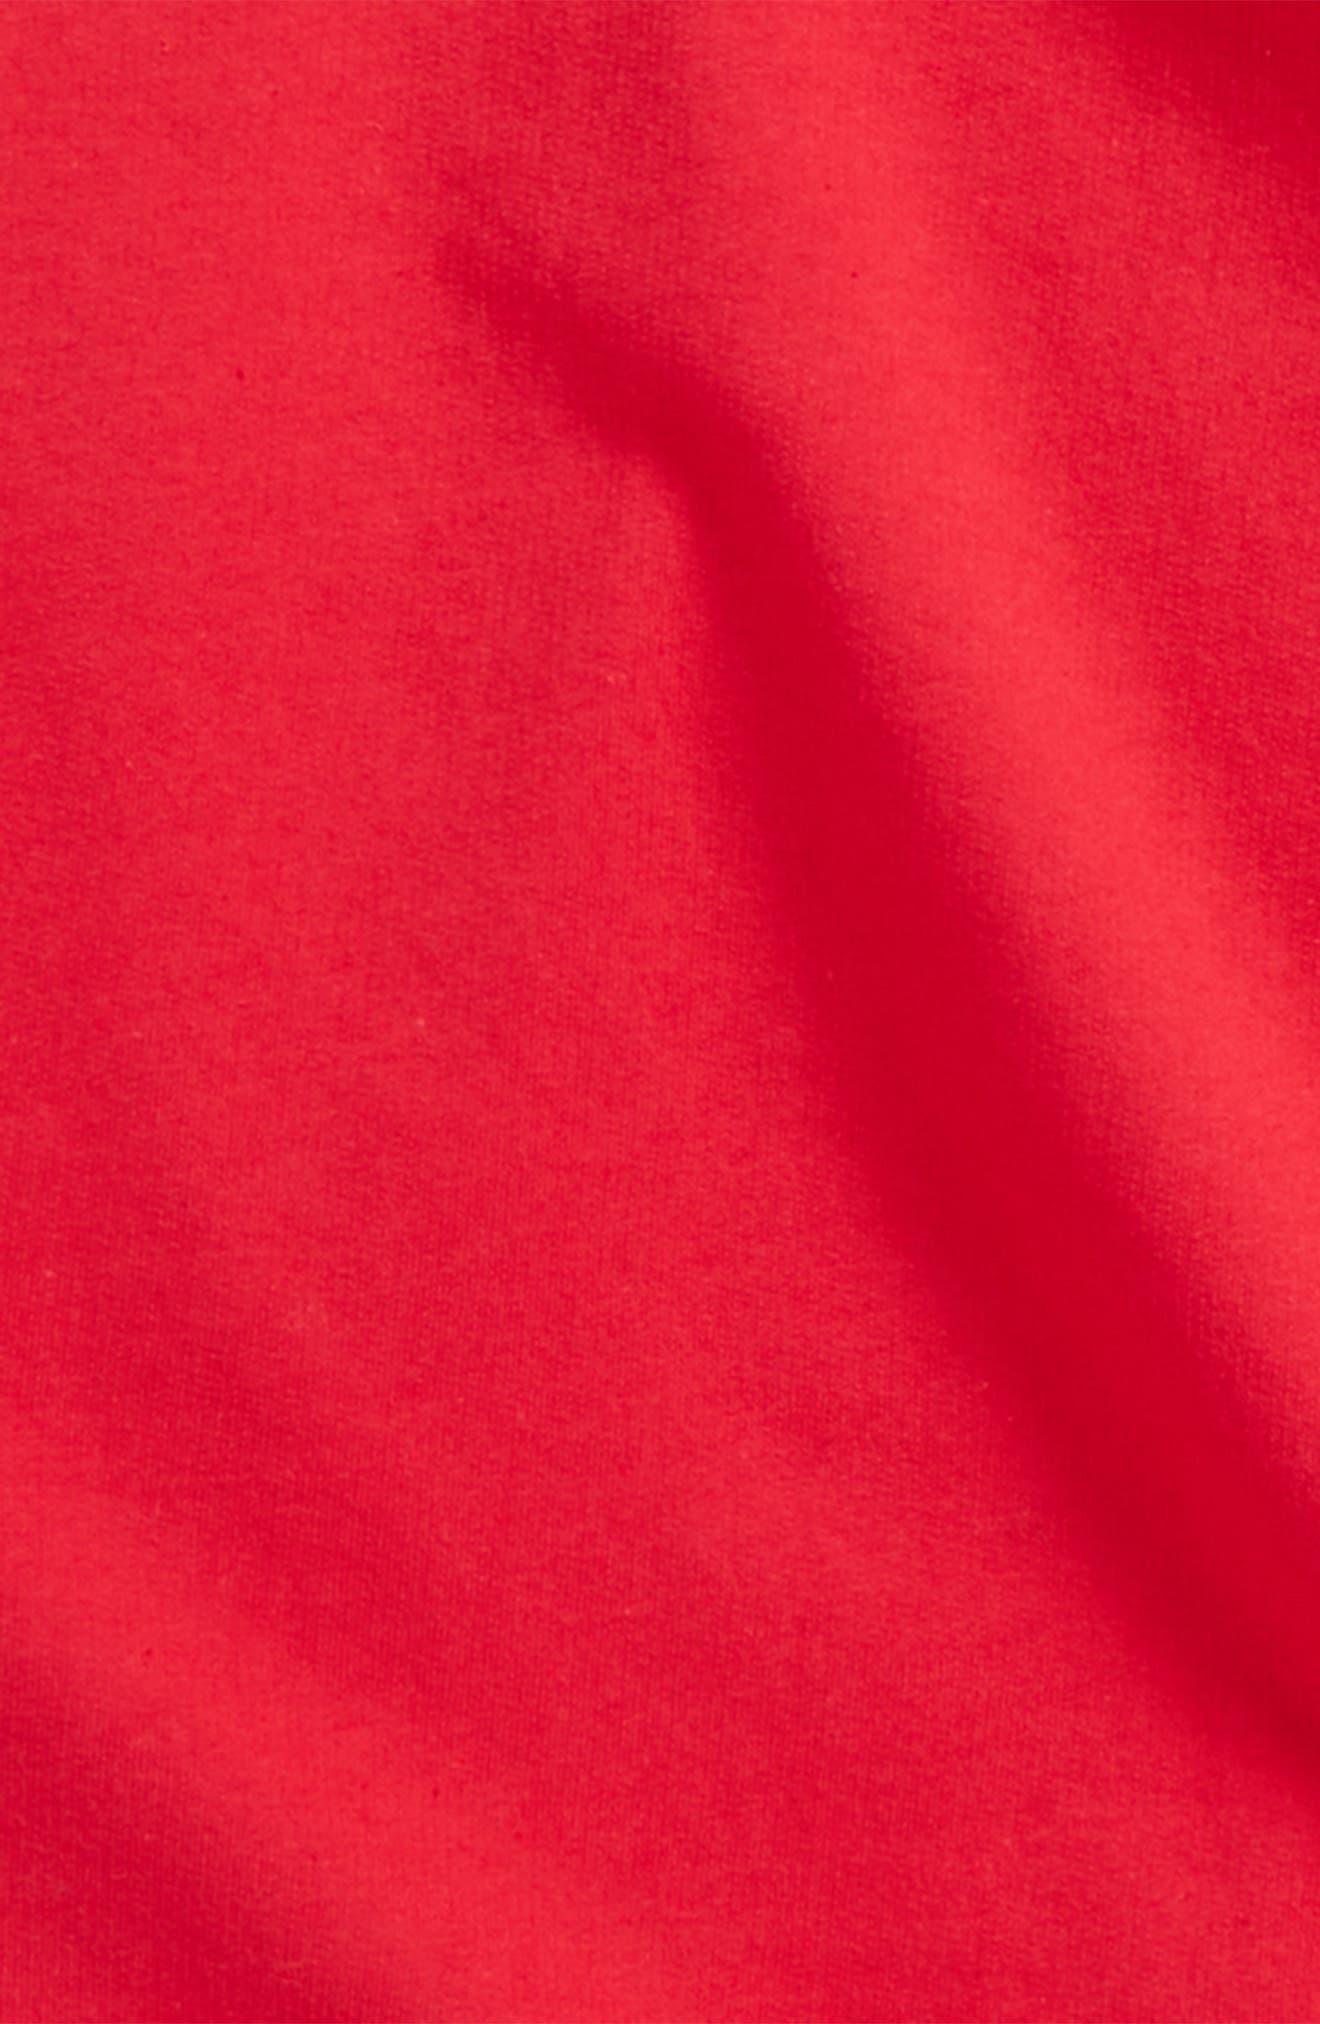 Stripe Trim Sweatshirt,                             Alternate thumbnail 2, color,                             600